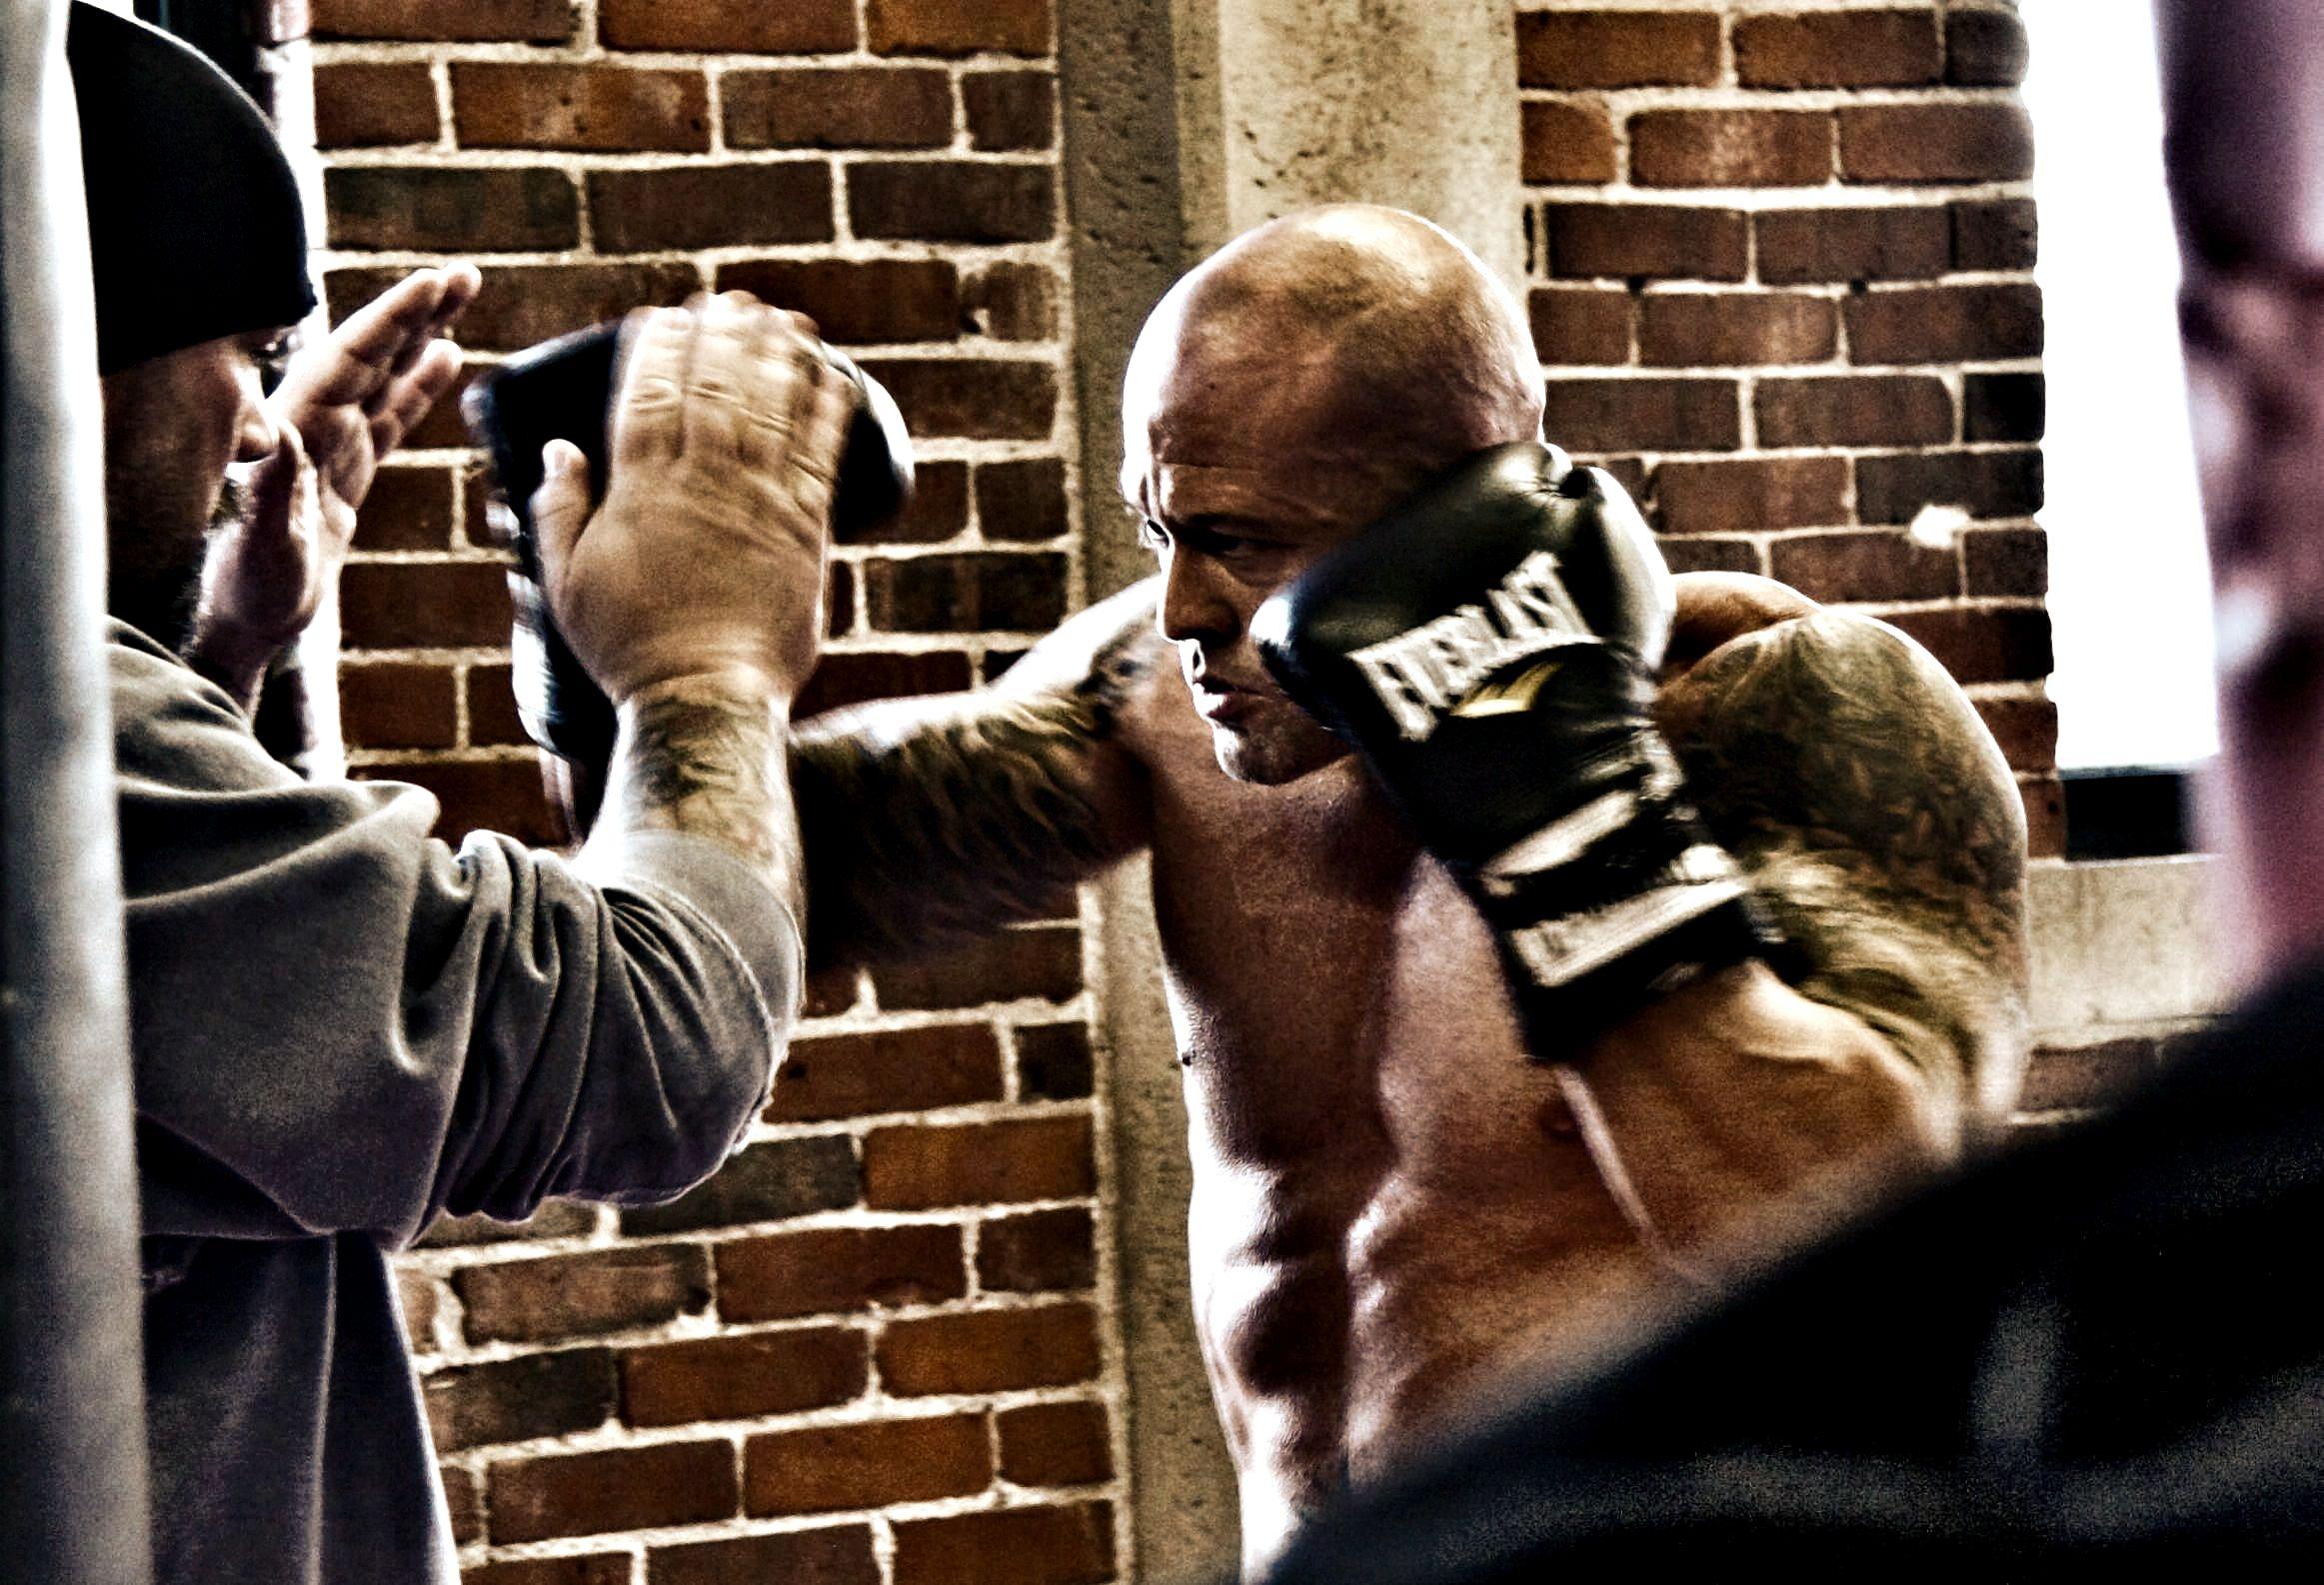 Actor & Model John Joseph Quinlan Boston Film Series Project Cruiser Weight Champion of the World On Set @ Dullea's Boxing Club 2015 #JohnQuinlan